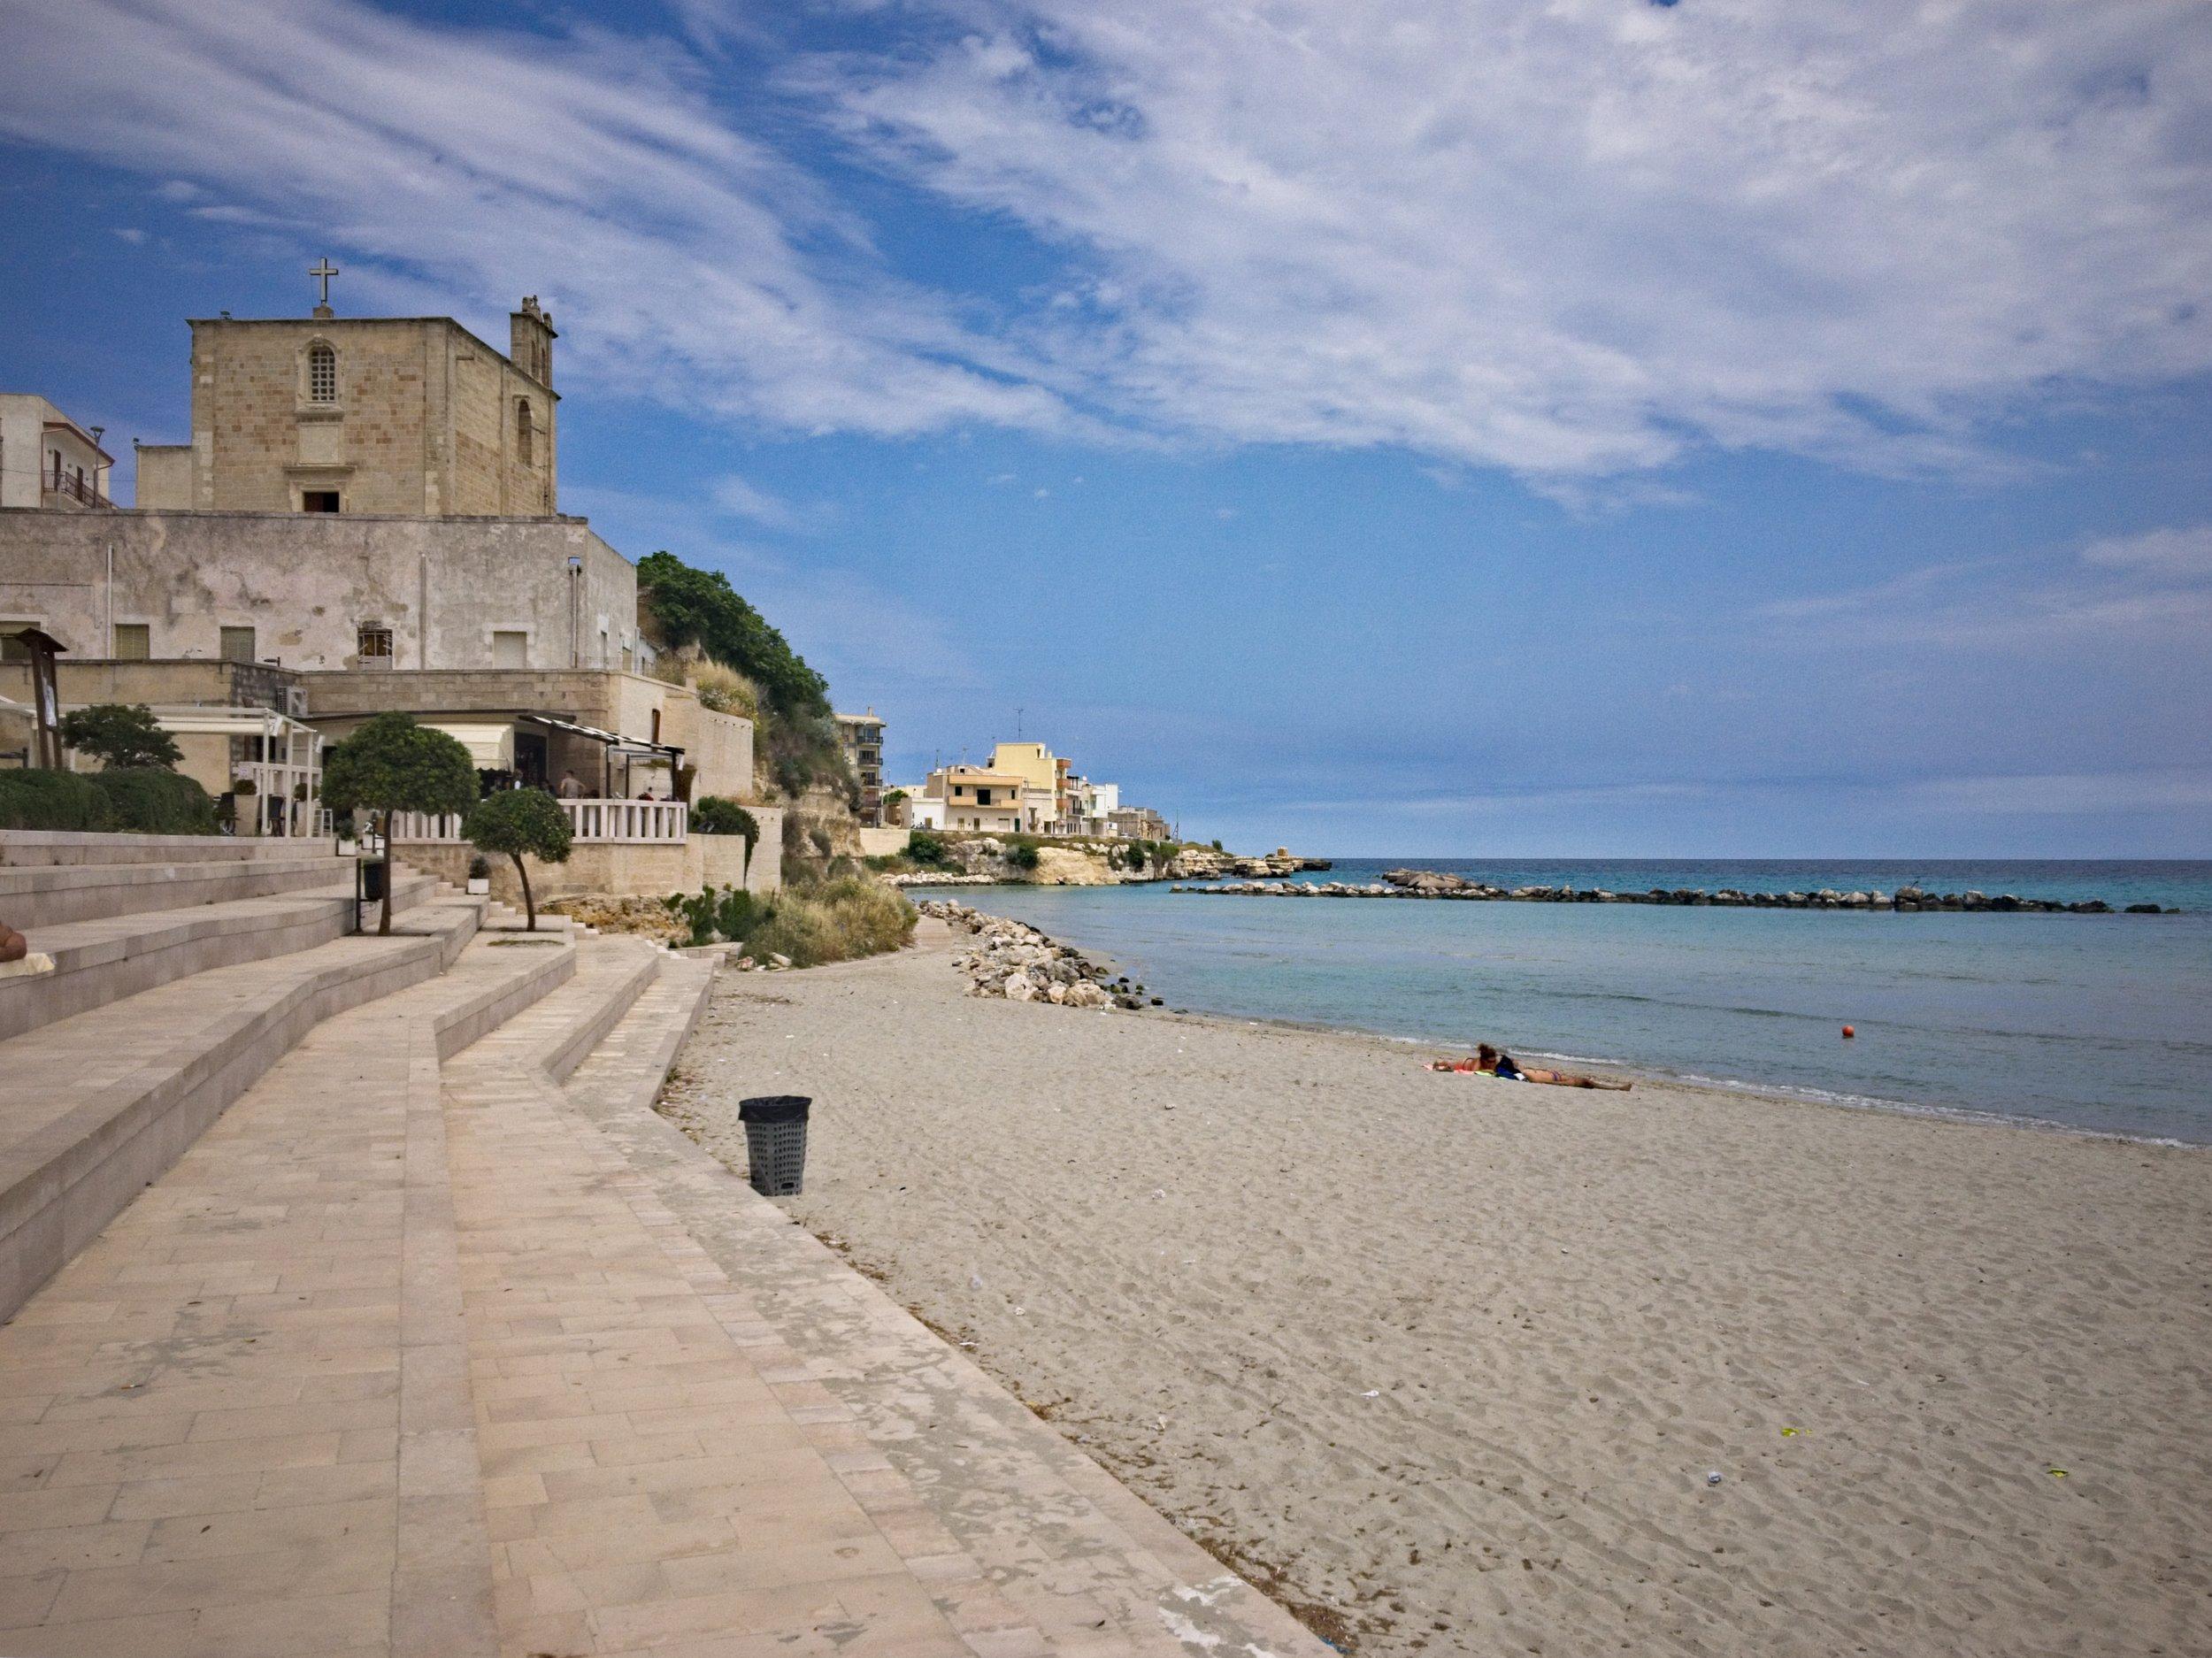 Italy-180515-123610.jpg